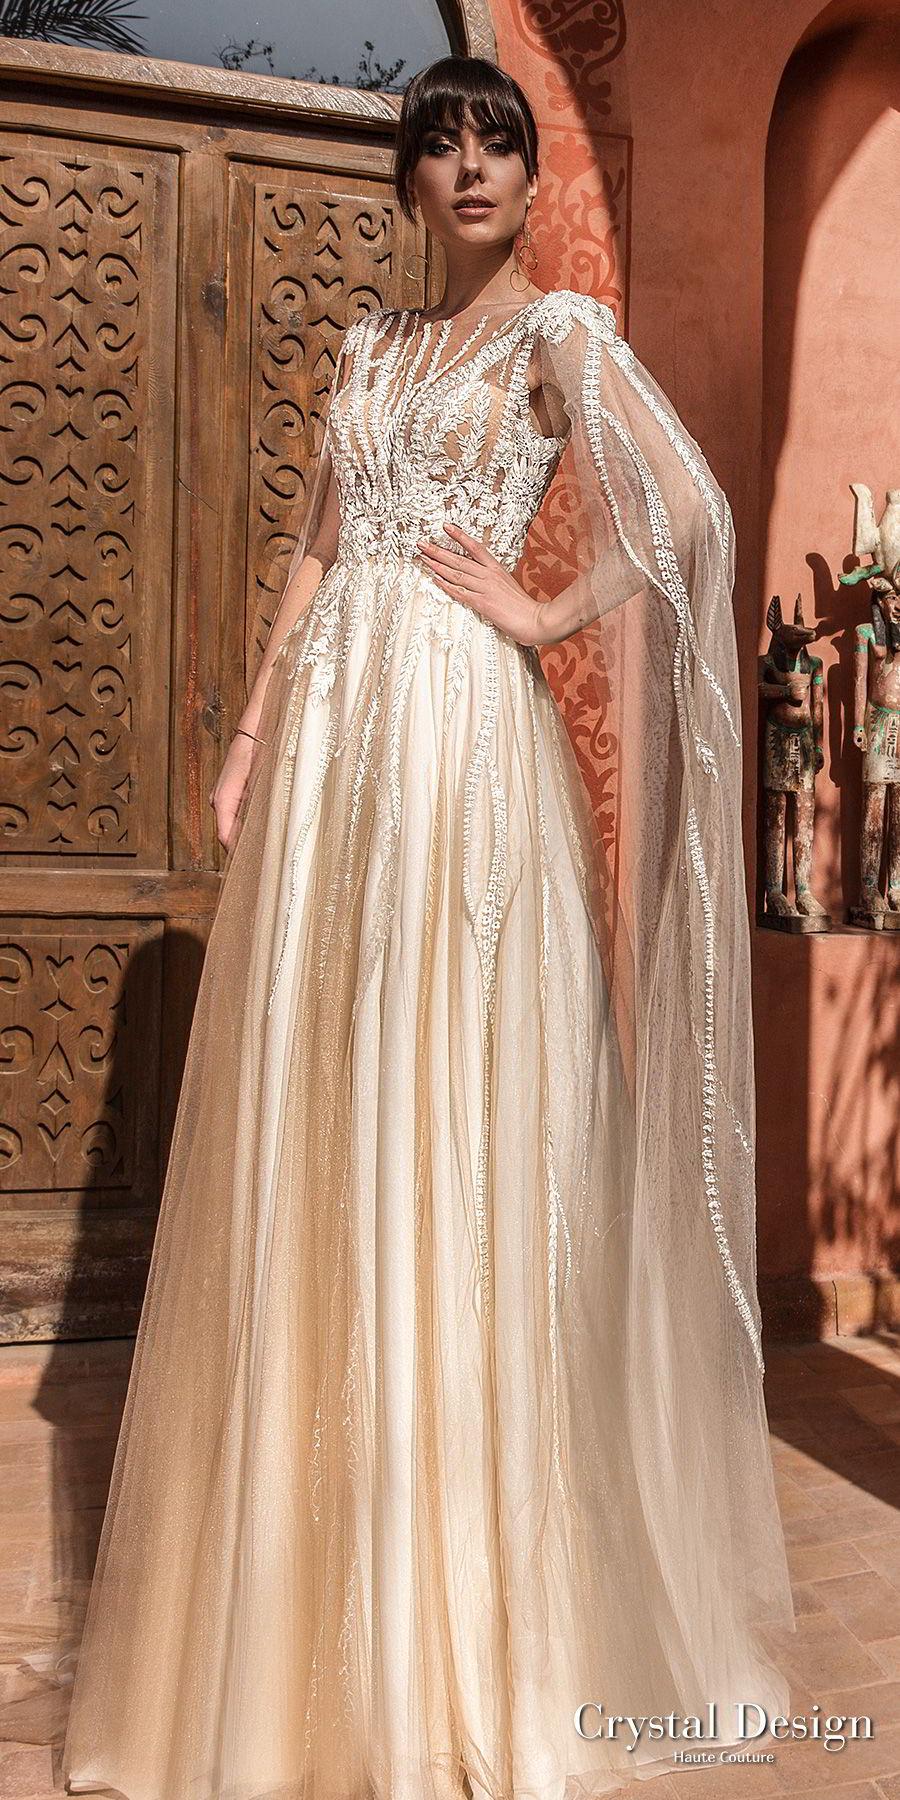 crystal design 2018 sleeveless bateau neck heavily embellished bodice romantic a line wedding dress cape open scoop back chapel train (elizion) mv